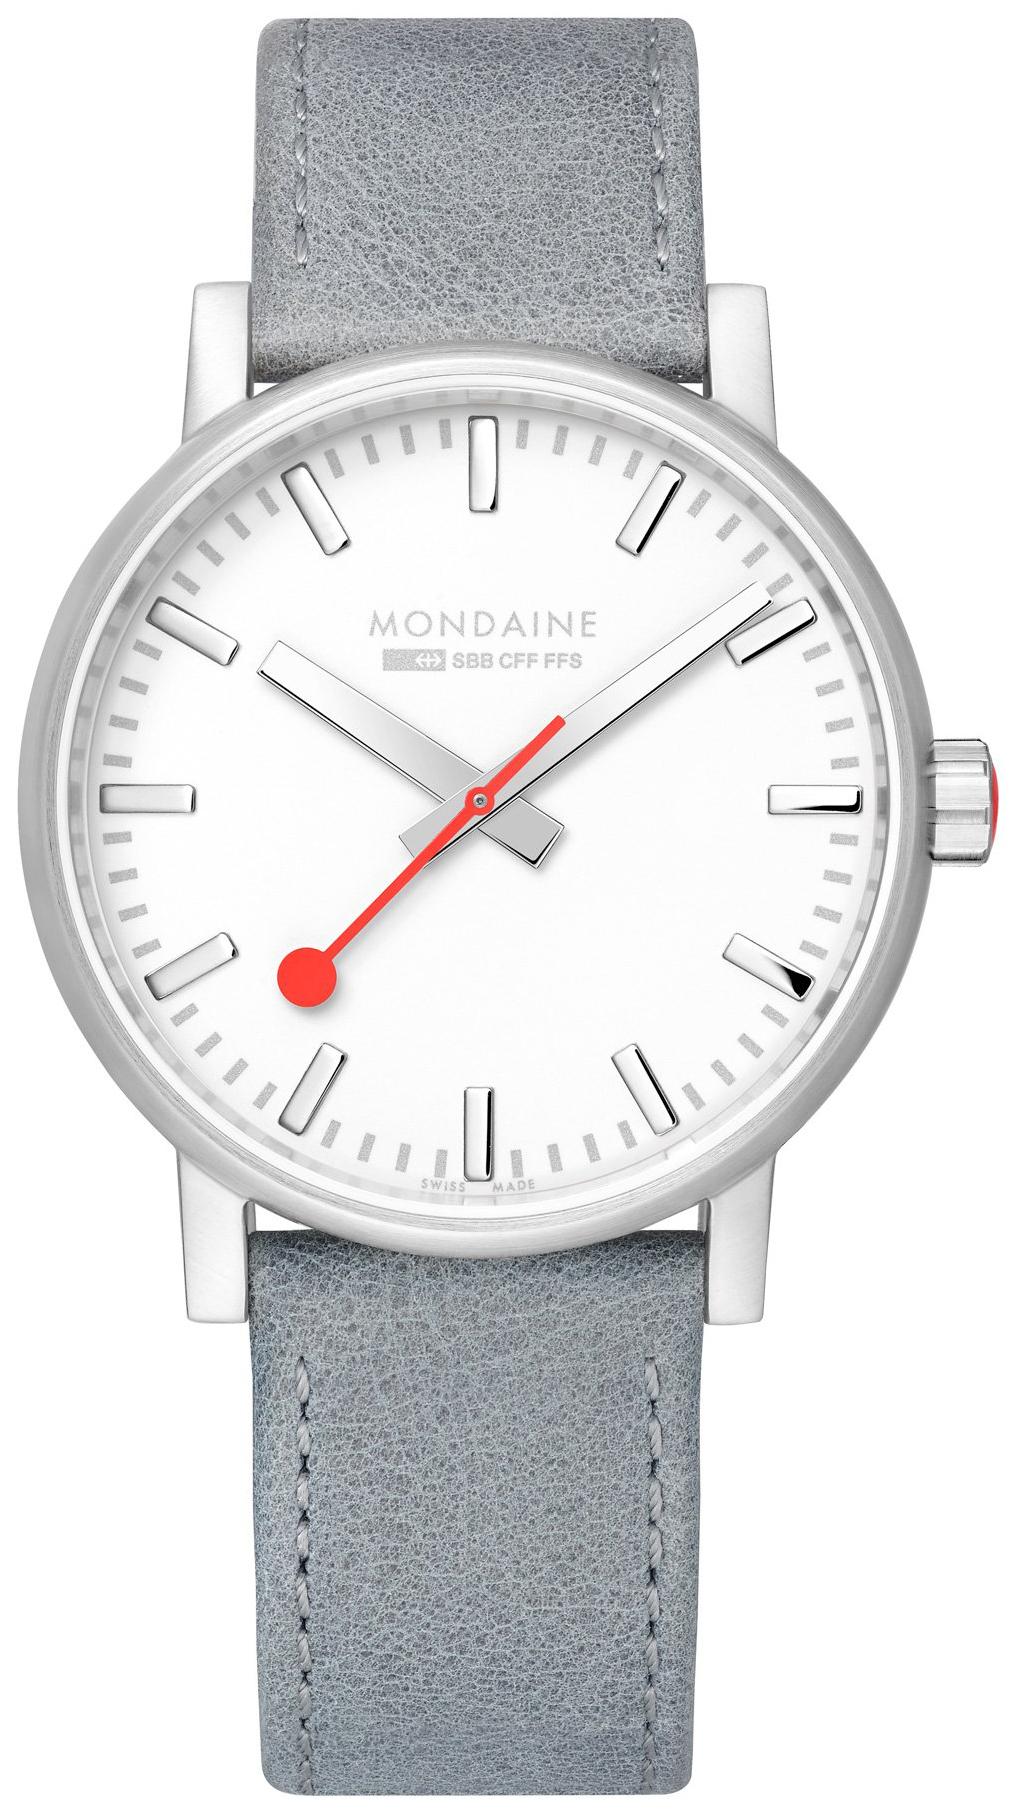 Mondaine 99999 Herreklokke MSE.40110.LH Hvit/Lær Ø40 mm - Mondaine